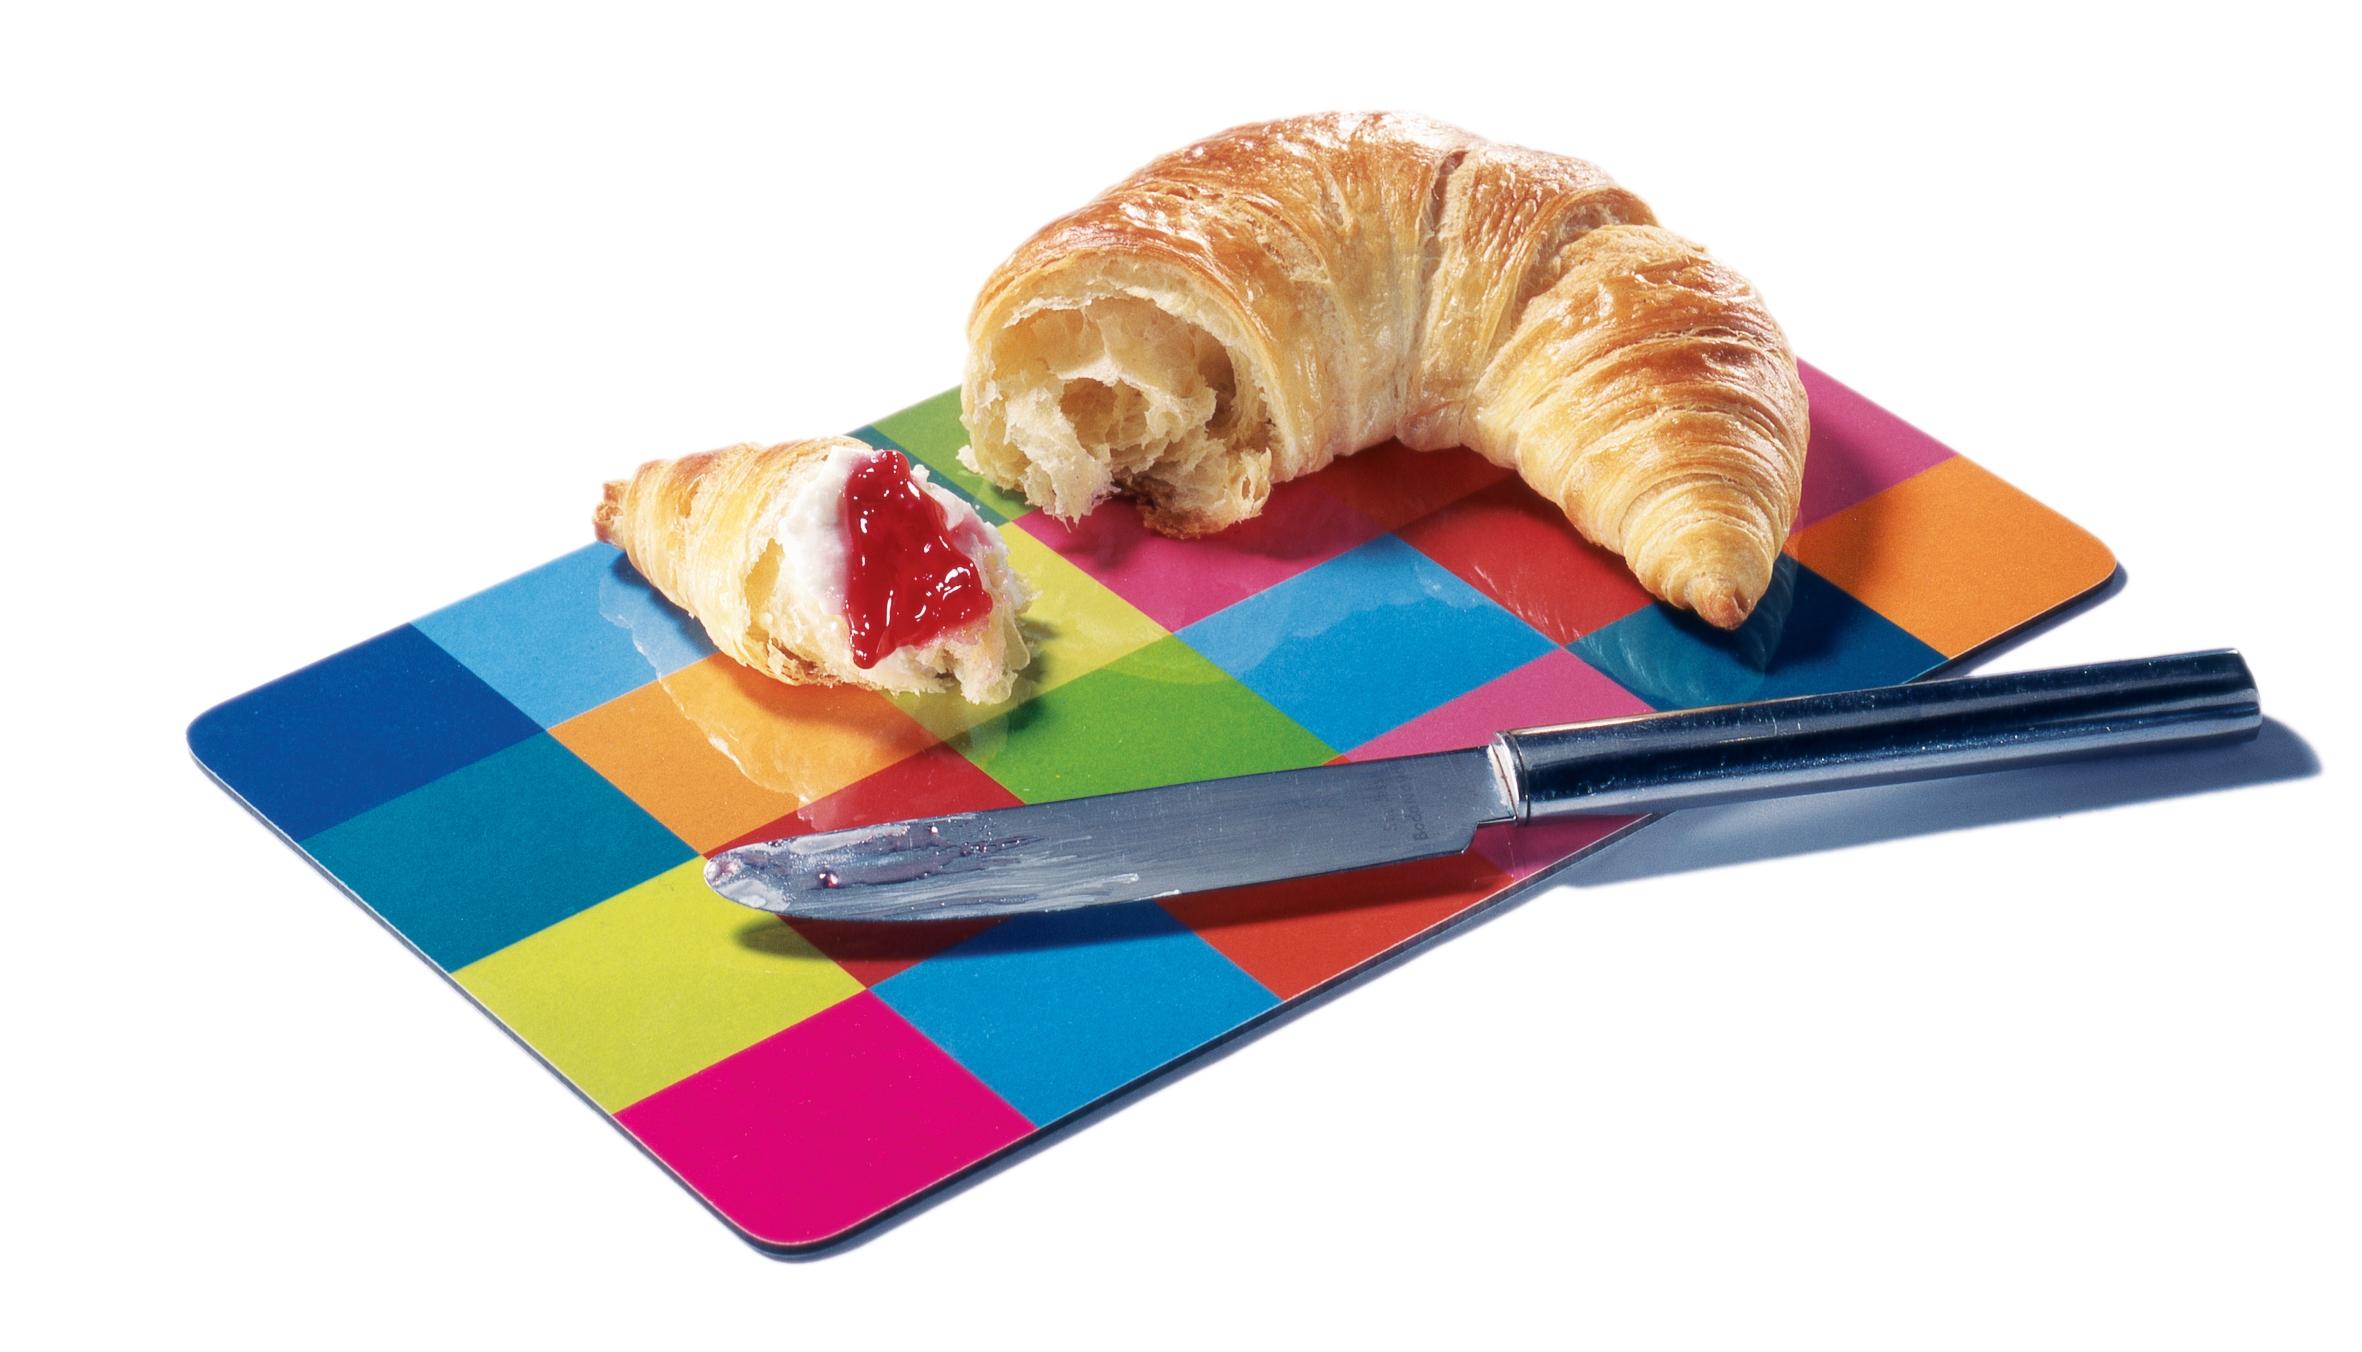 ontbijtplankjes en placemats